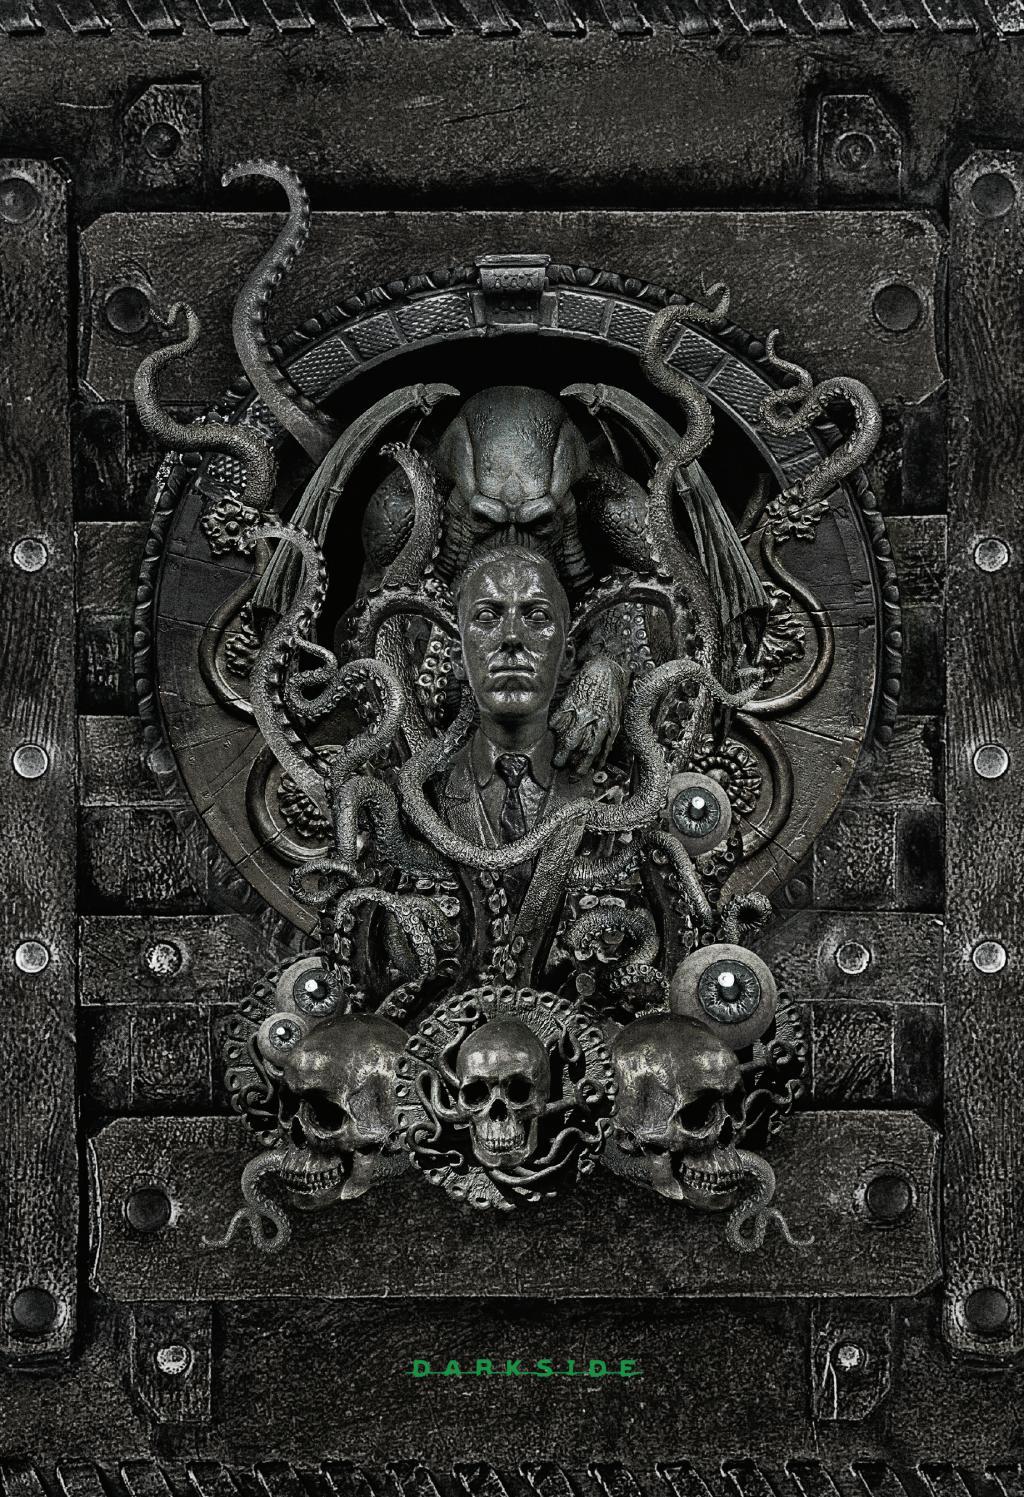 HP Lovecraft: Medo Clássico Vol. 1, da Editora Darkside